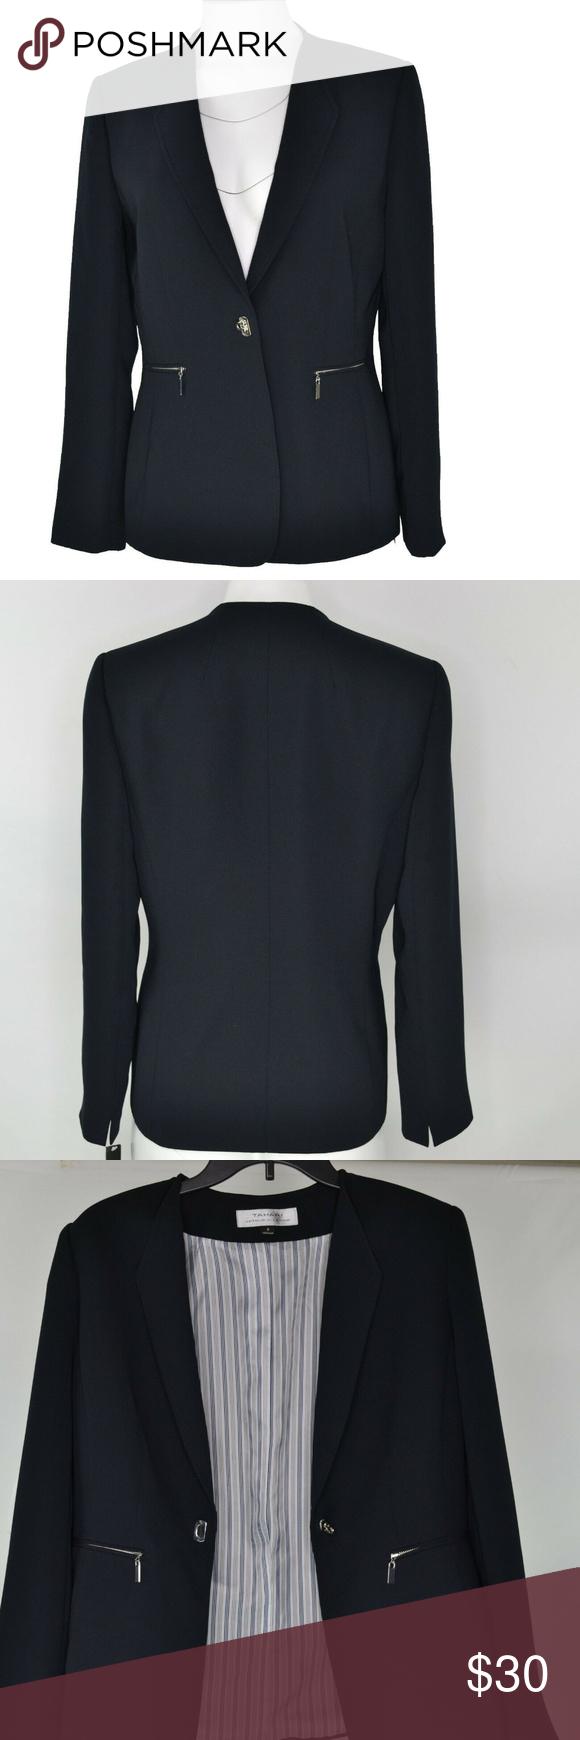 Tahari Womens Missy Crepe Suit Jacket Black 8 New Clothes Design Jackets Colored Blazer [ 1740 x 580 Pixel ]